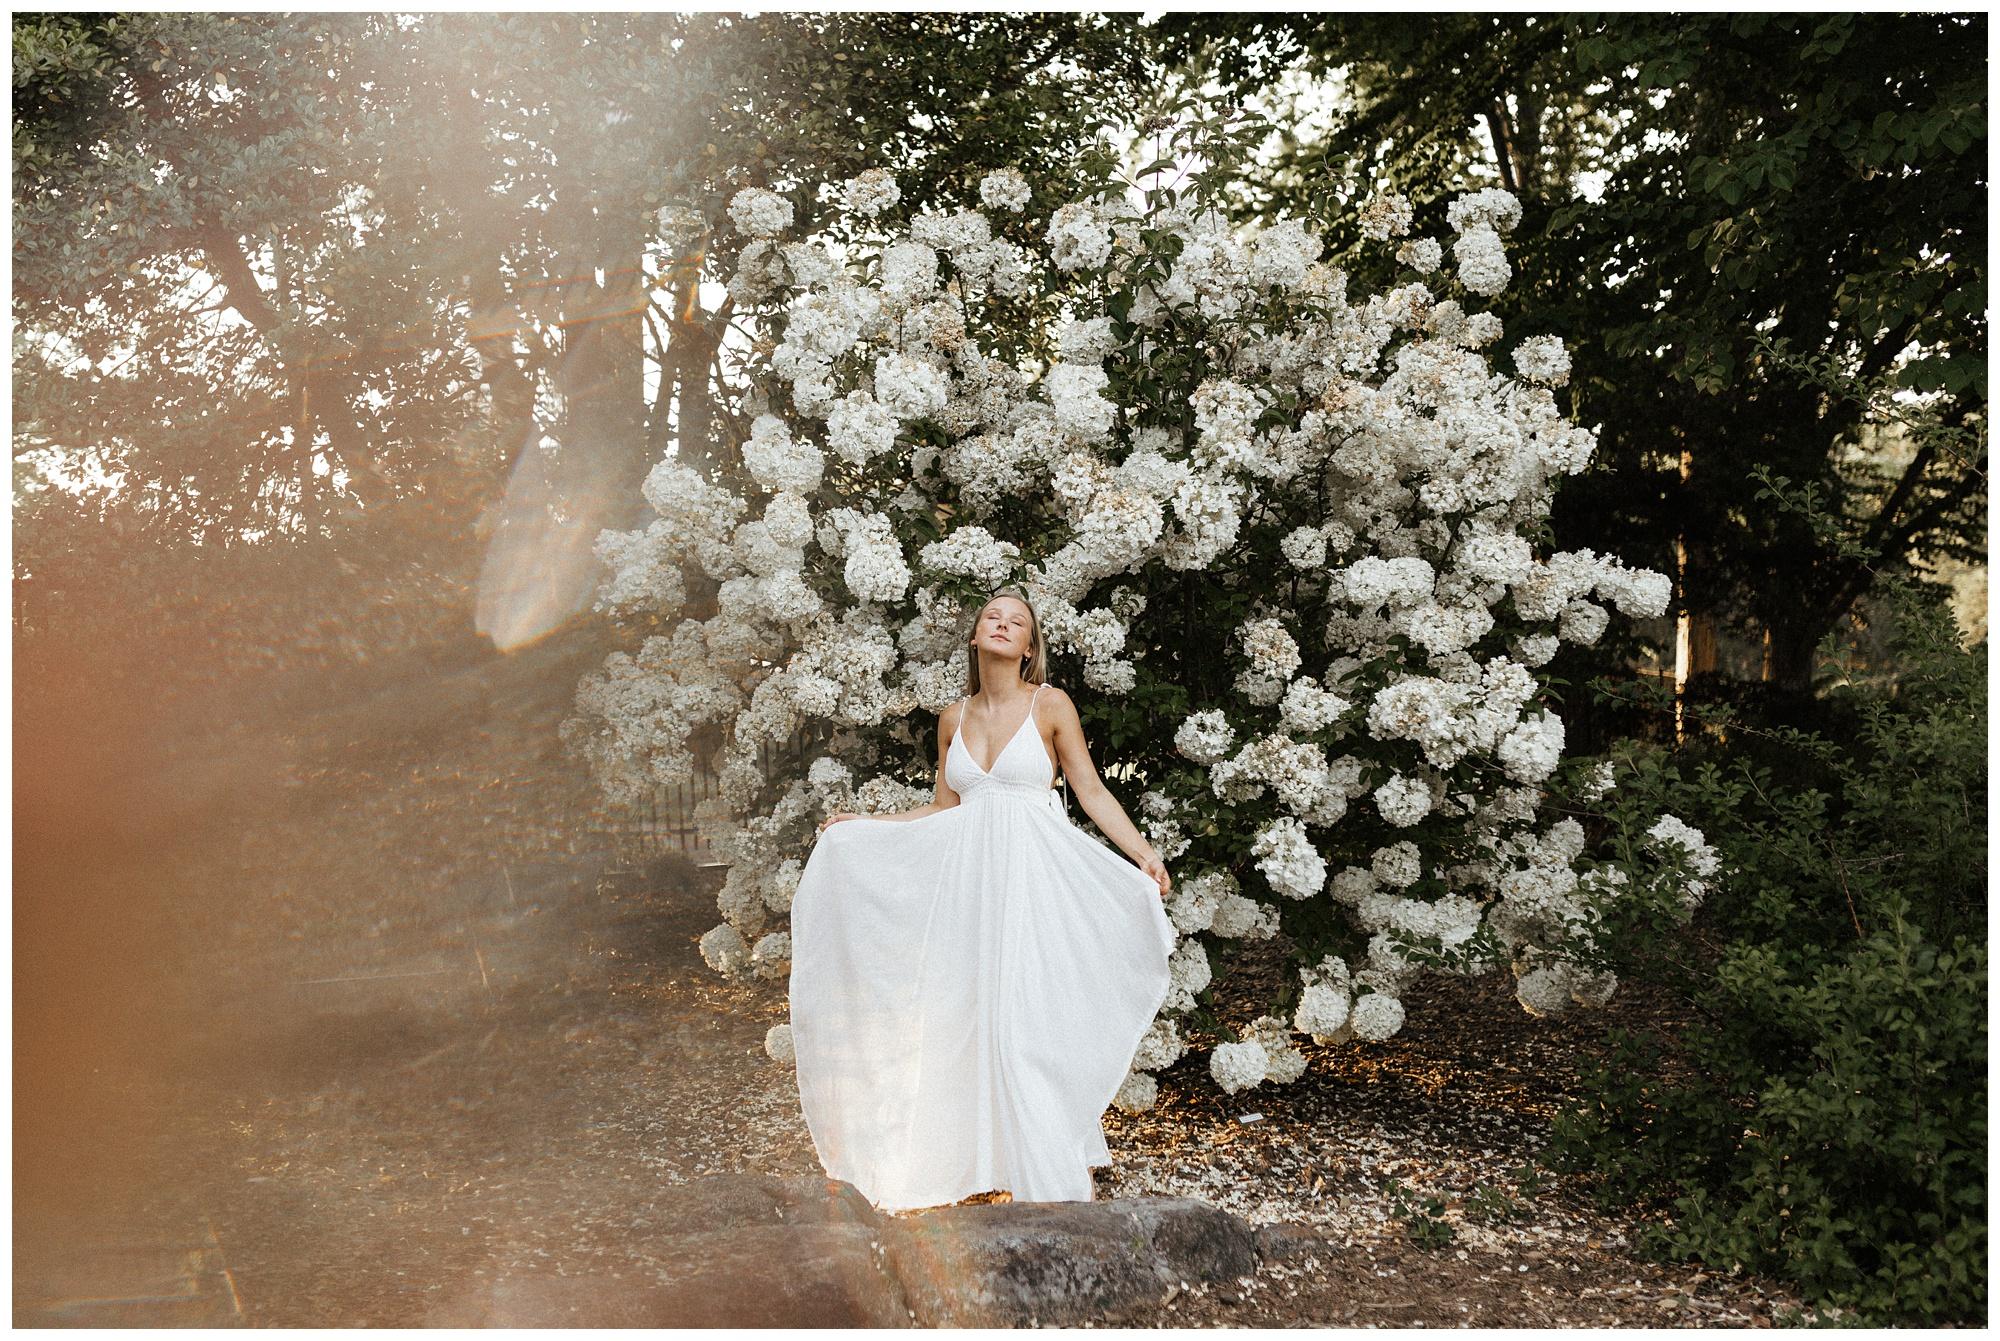 House-of-Ivy-Photography-North Carolina-Photographer-Tanglewood-Winston-Salem_0031.jpg